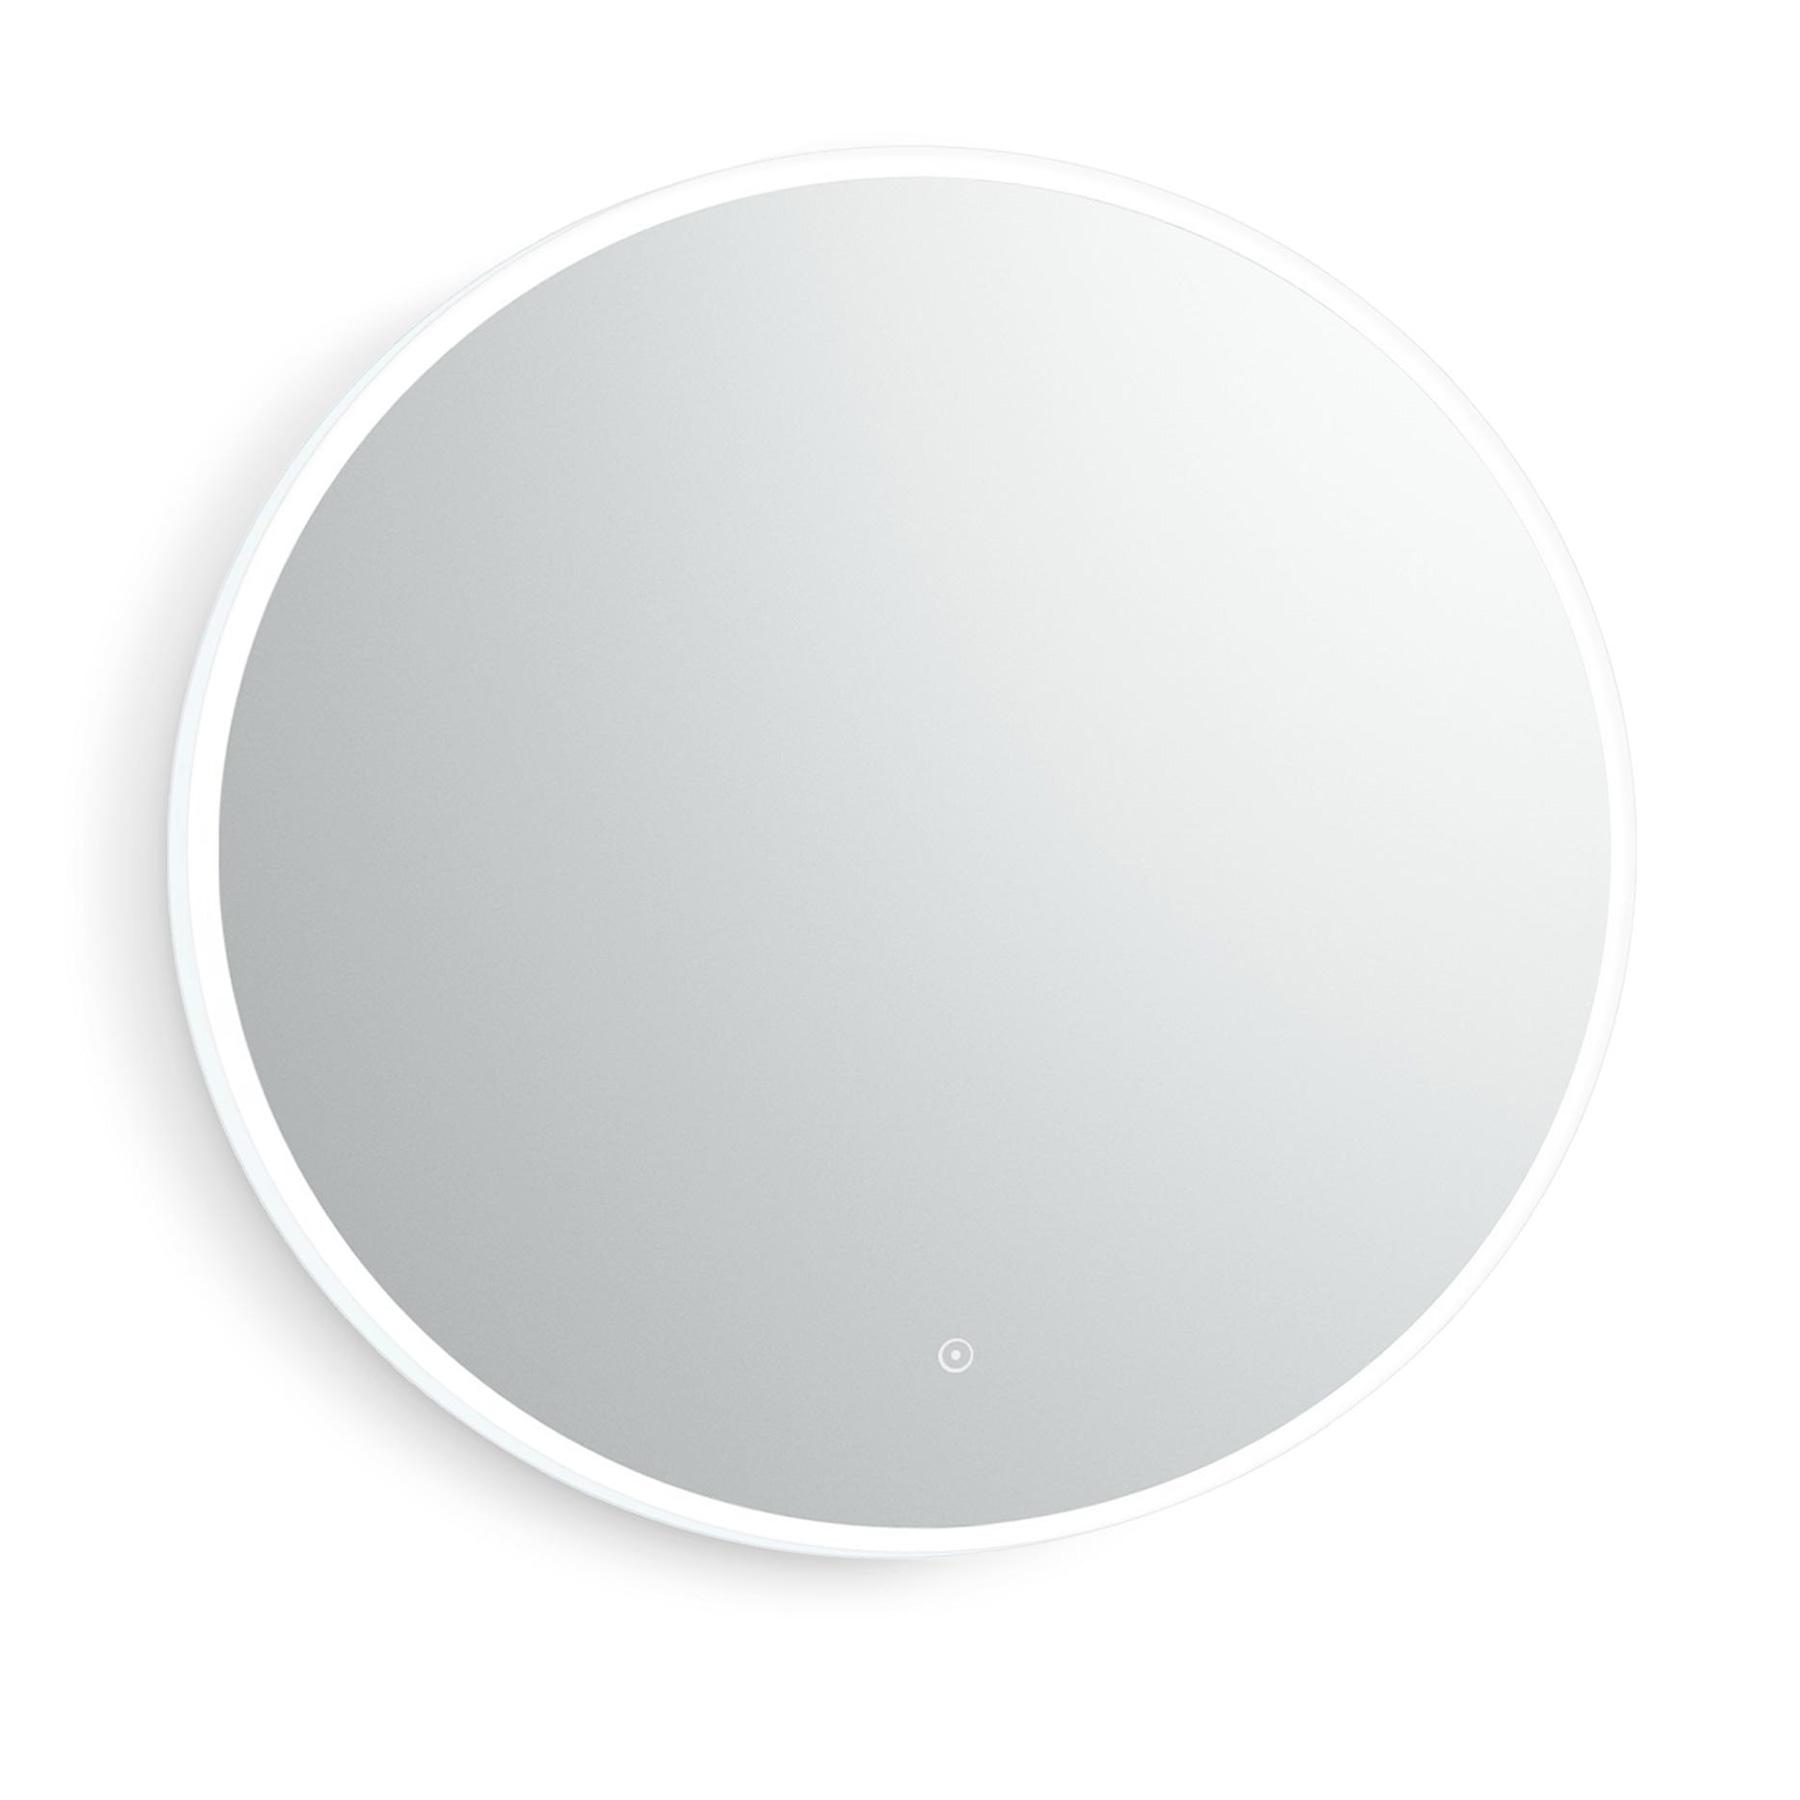 Spegel Svedbergs Selfie Rund LED Dimbar